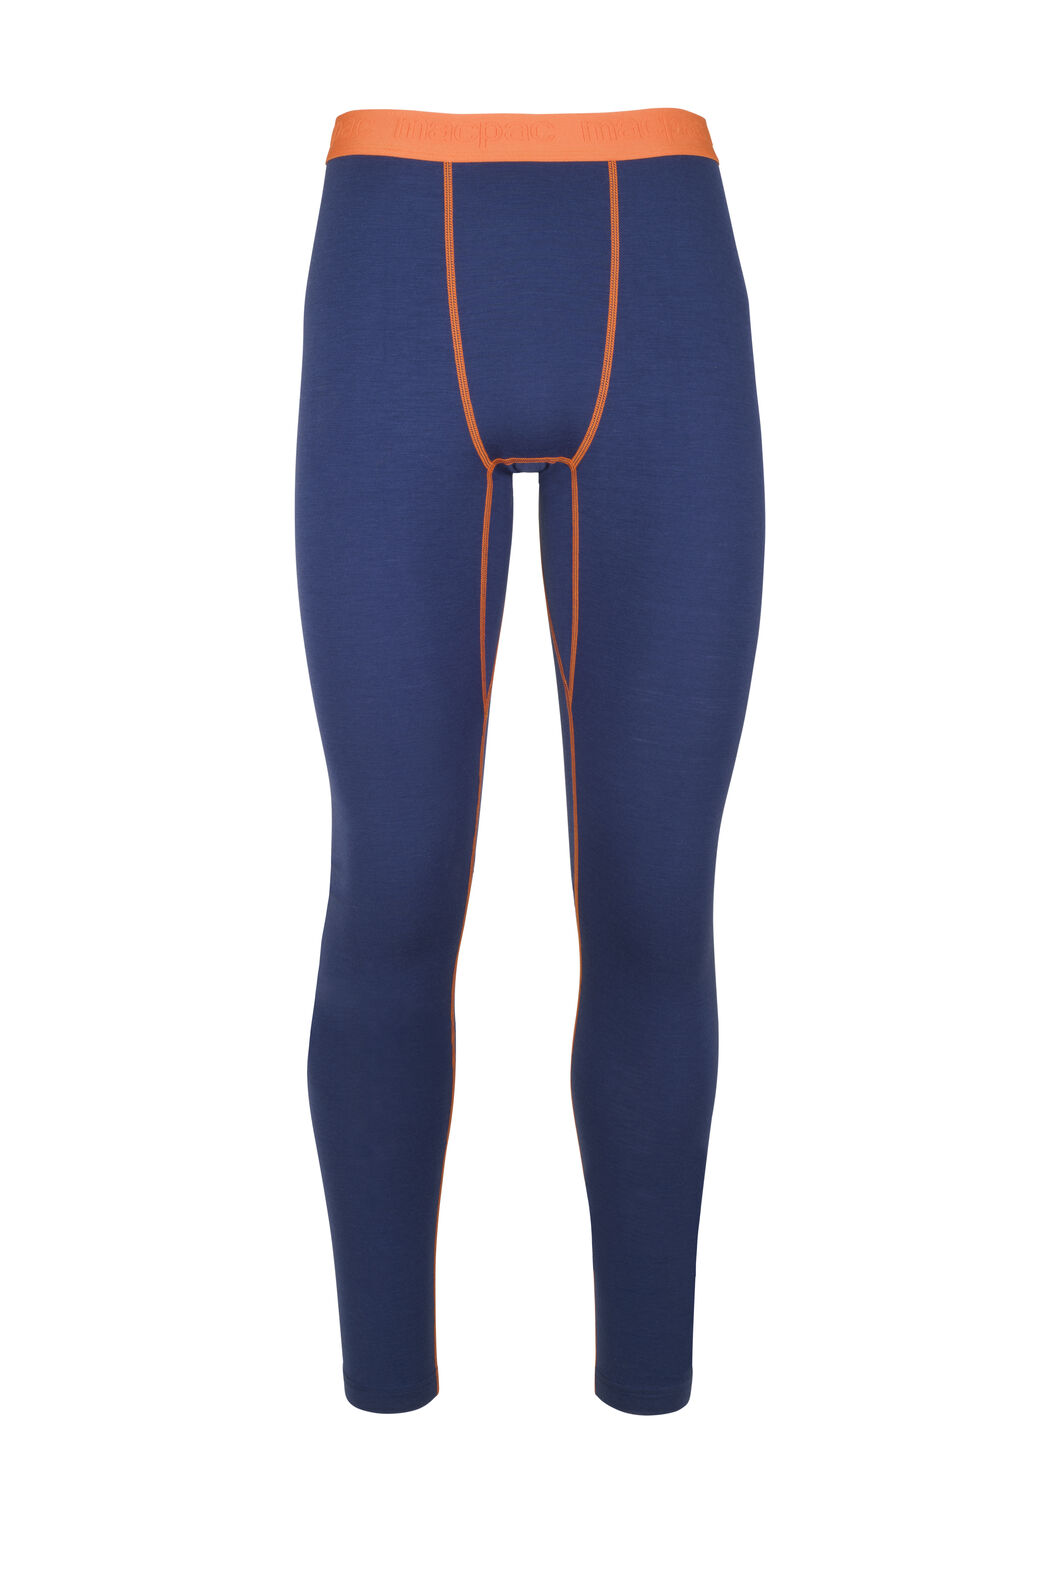 Macpac 180 Merino Long Johns - Men's, Blue Depths/Burnt Orange, hi-res